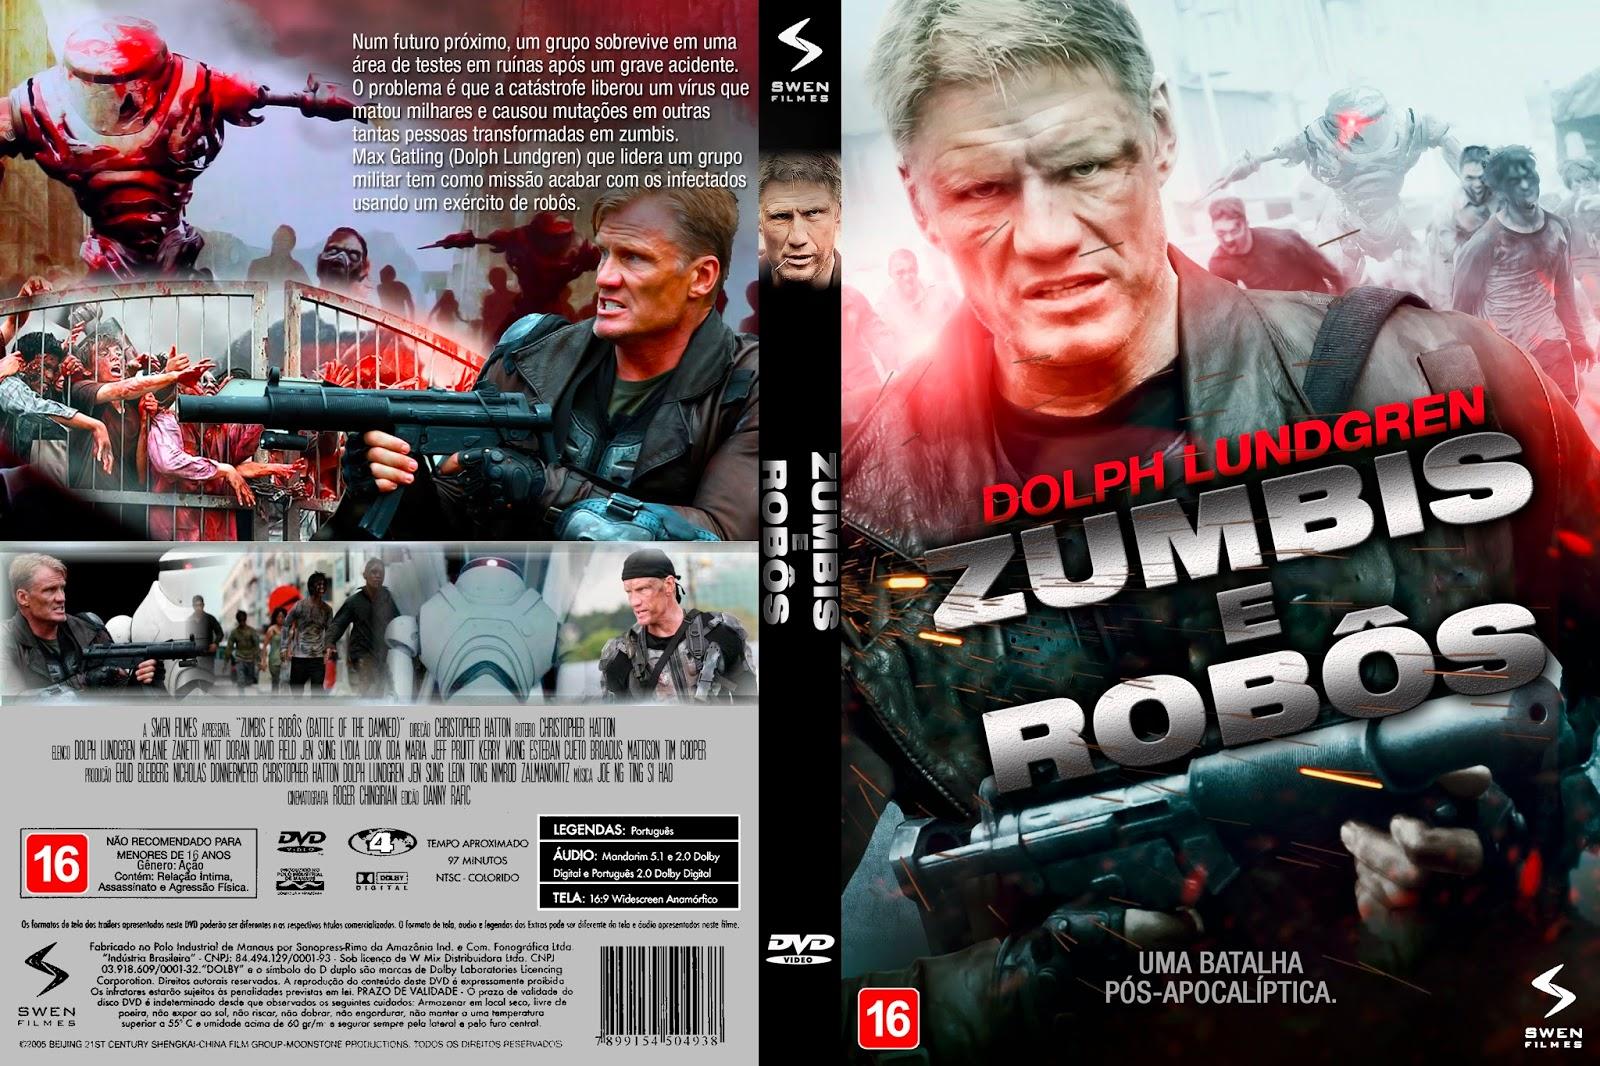 Baixar Zumbis e Robôs DVDRip XviD Dual Áudio Zumbis 2Be 2BRob 25C3 25B4s